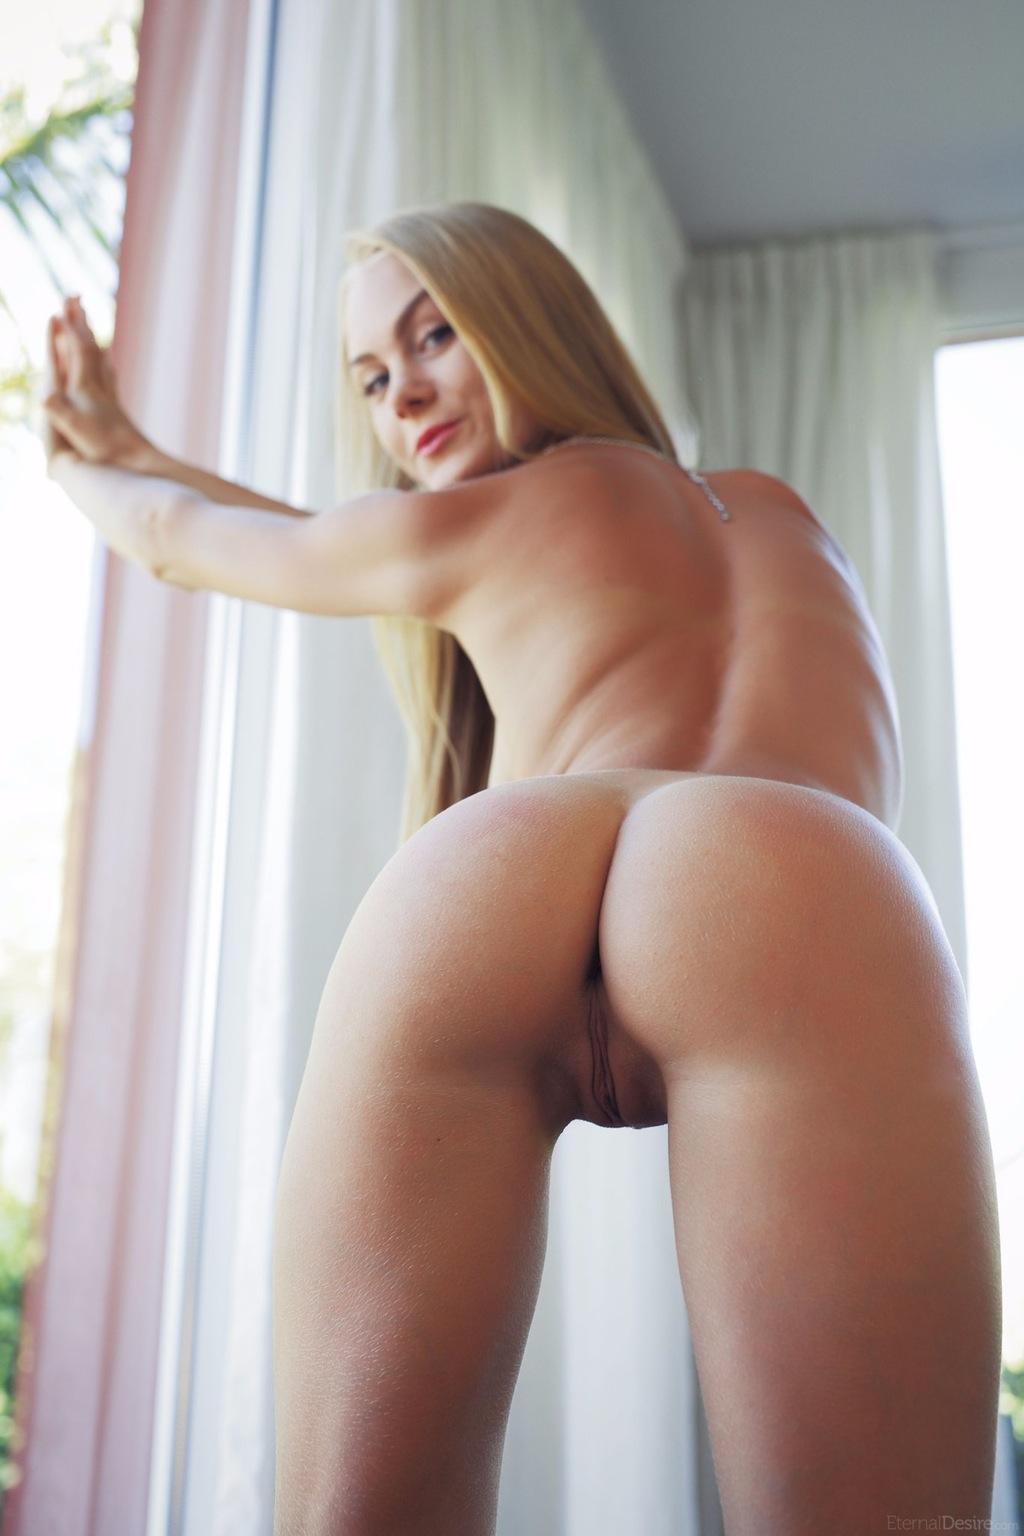 Anal Best Porn Pics